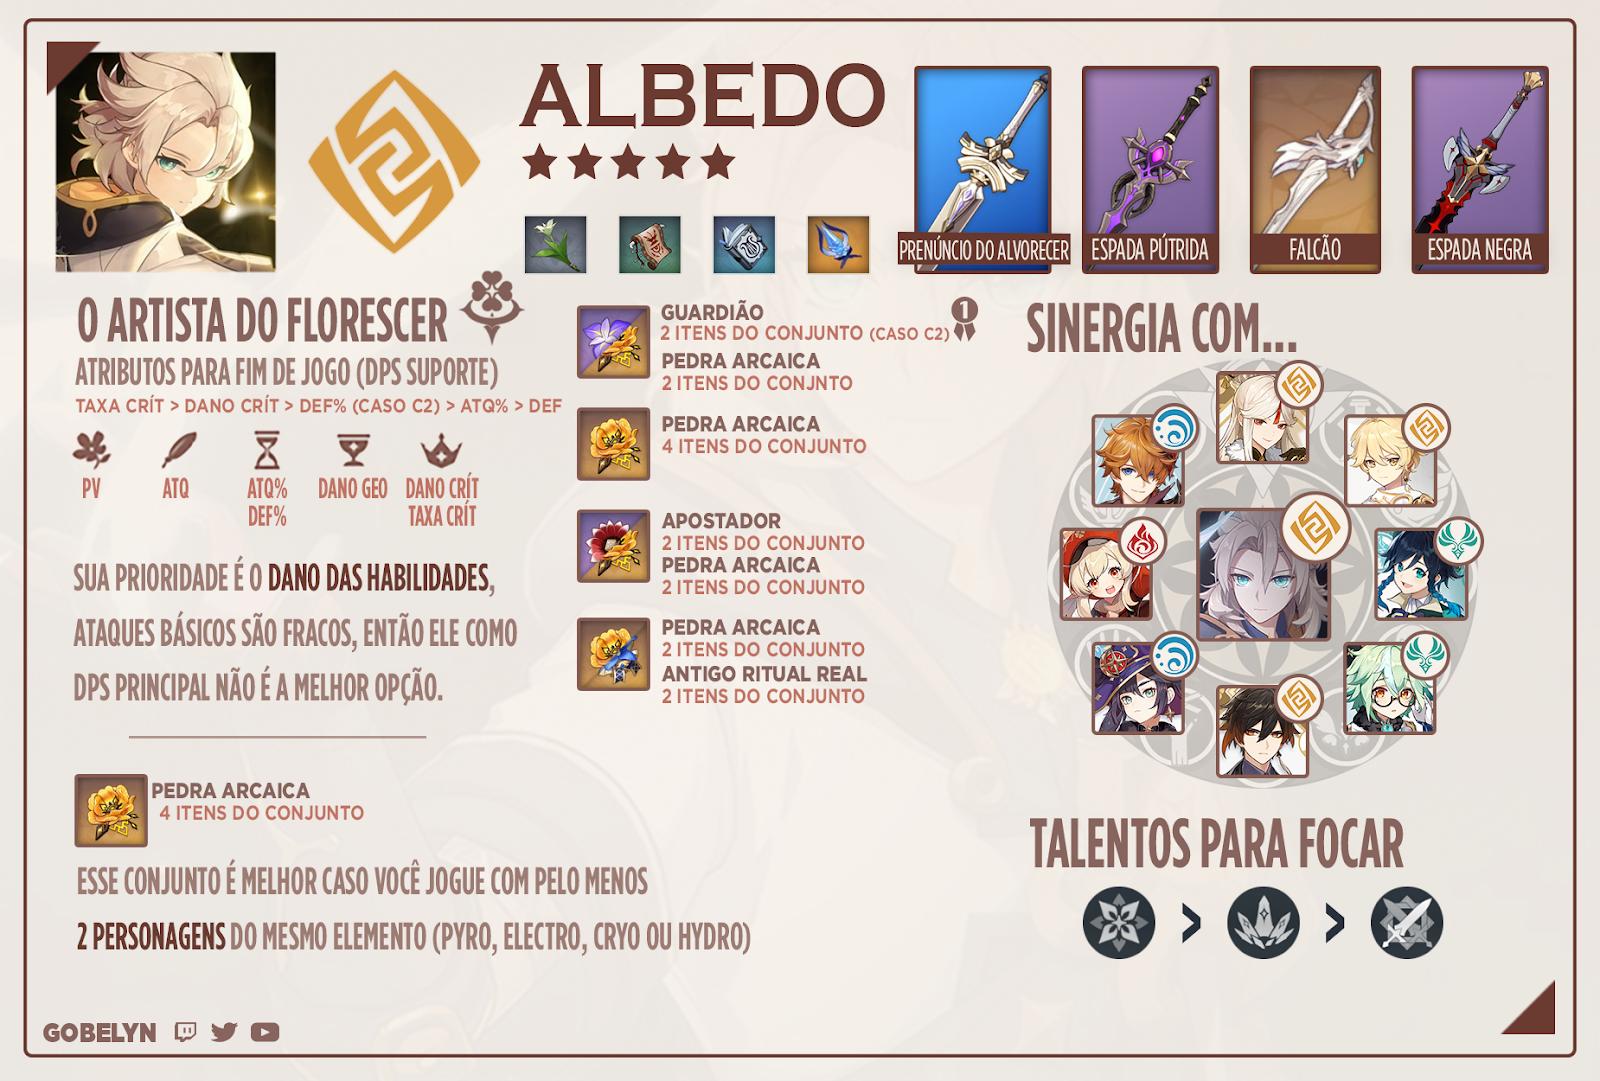 albedo genshin impact gobelyn portugues